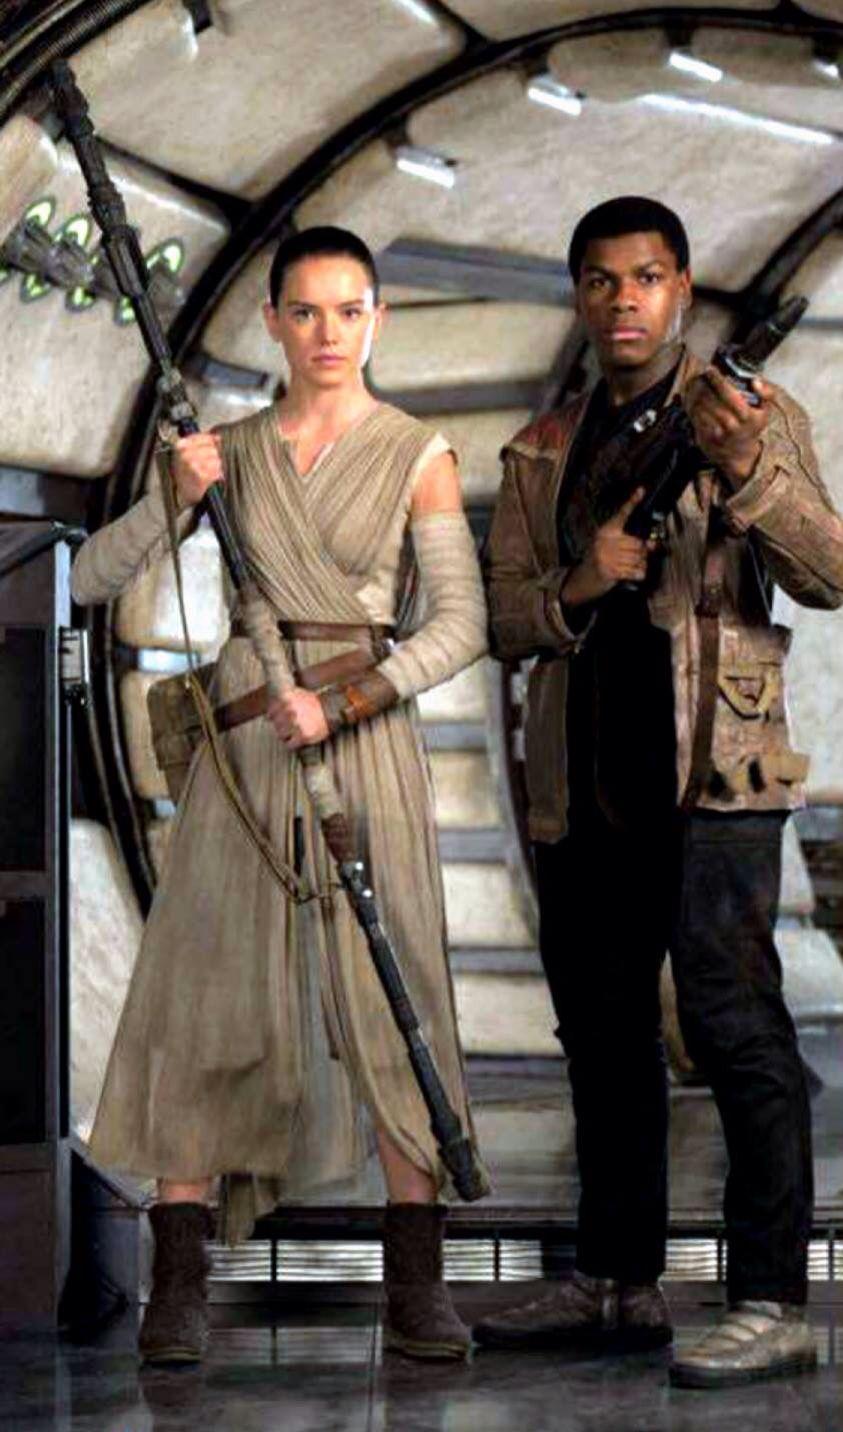 Daisy Ridley & John Boyega as Rey and Finn 'Star Wars: The Force Awakens' (promo shoot)